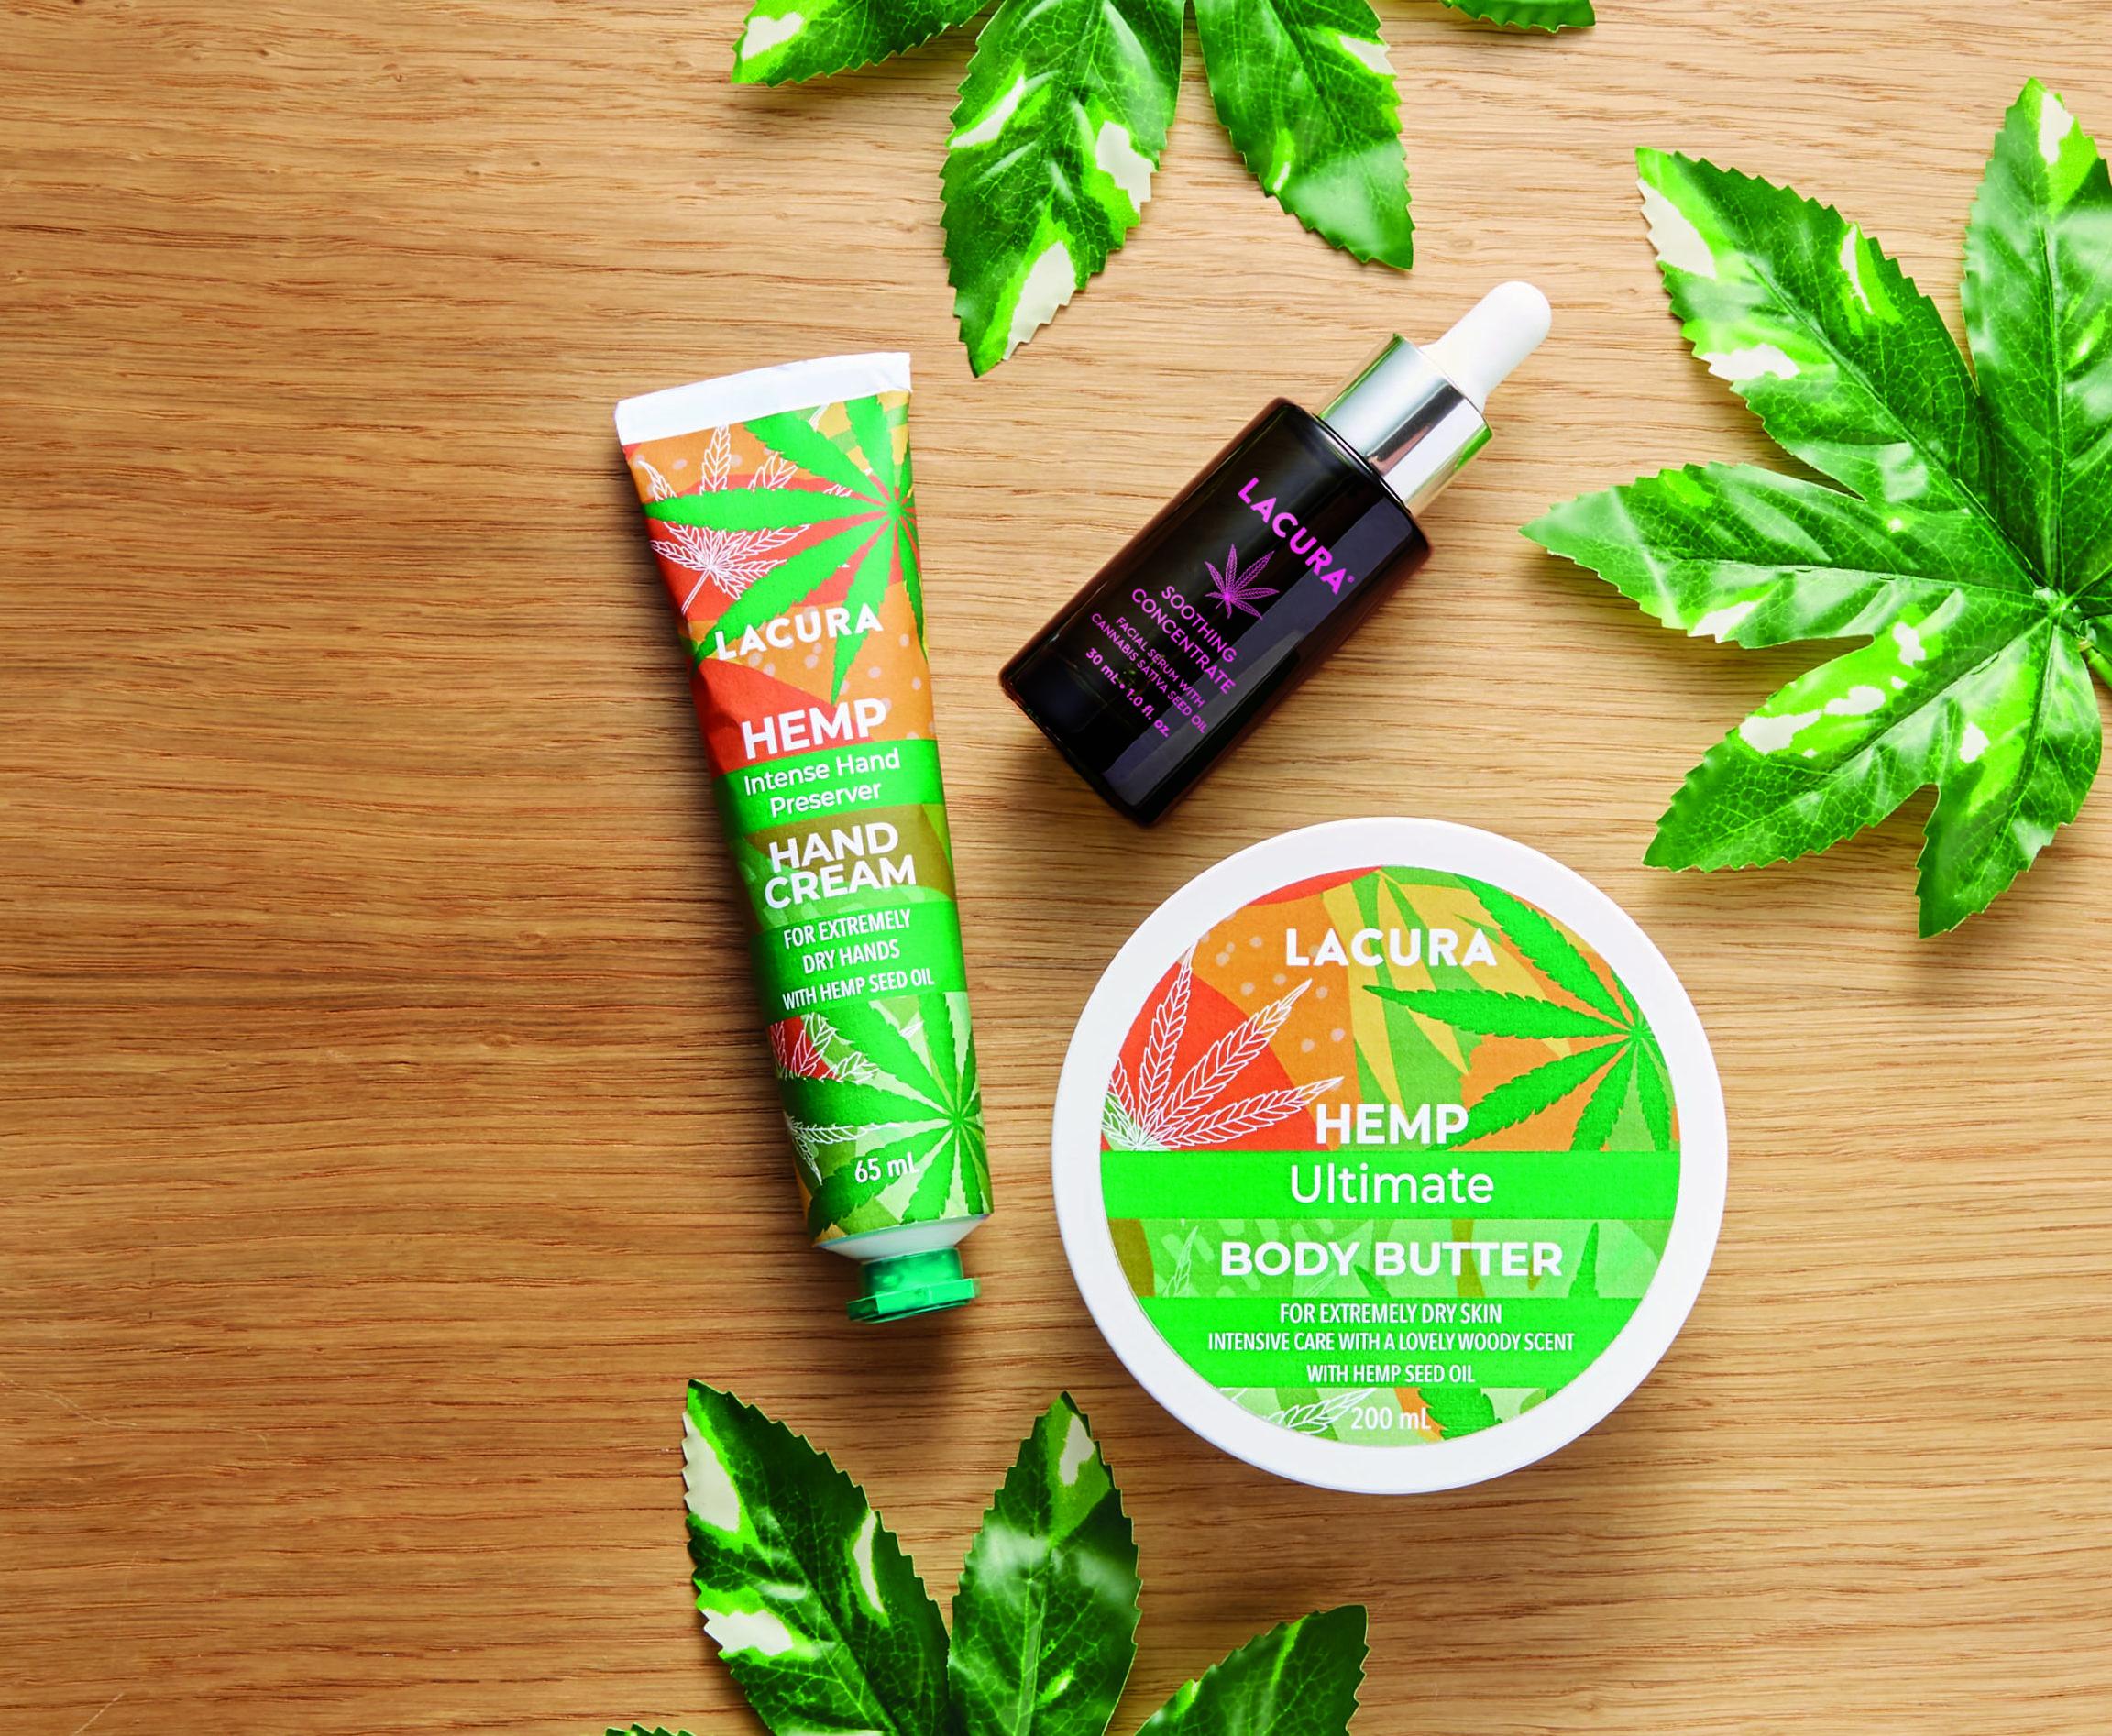 Beauty News: Aldi Lacura Hemp Skincare Collection